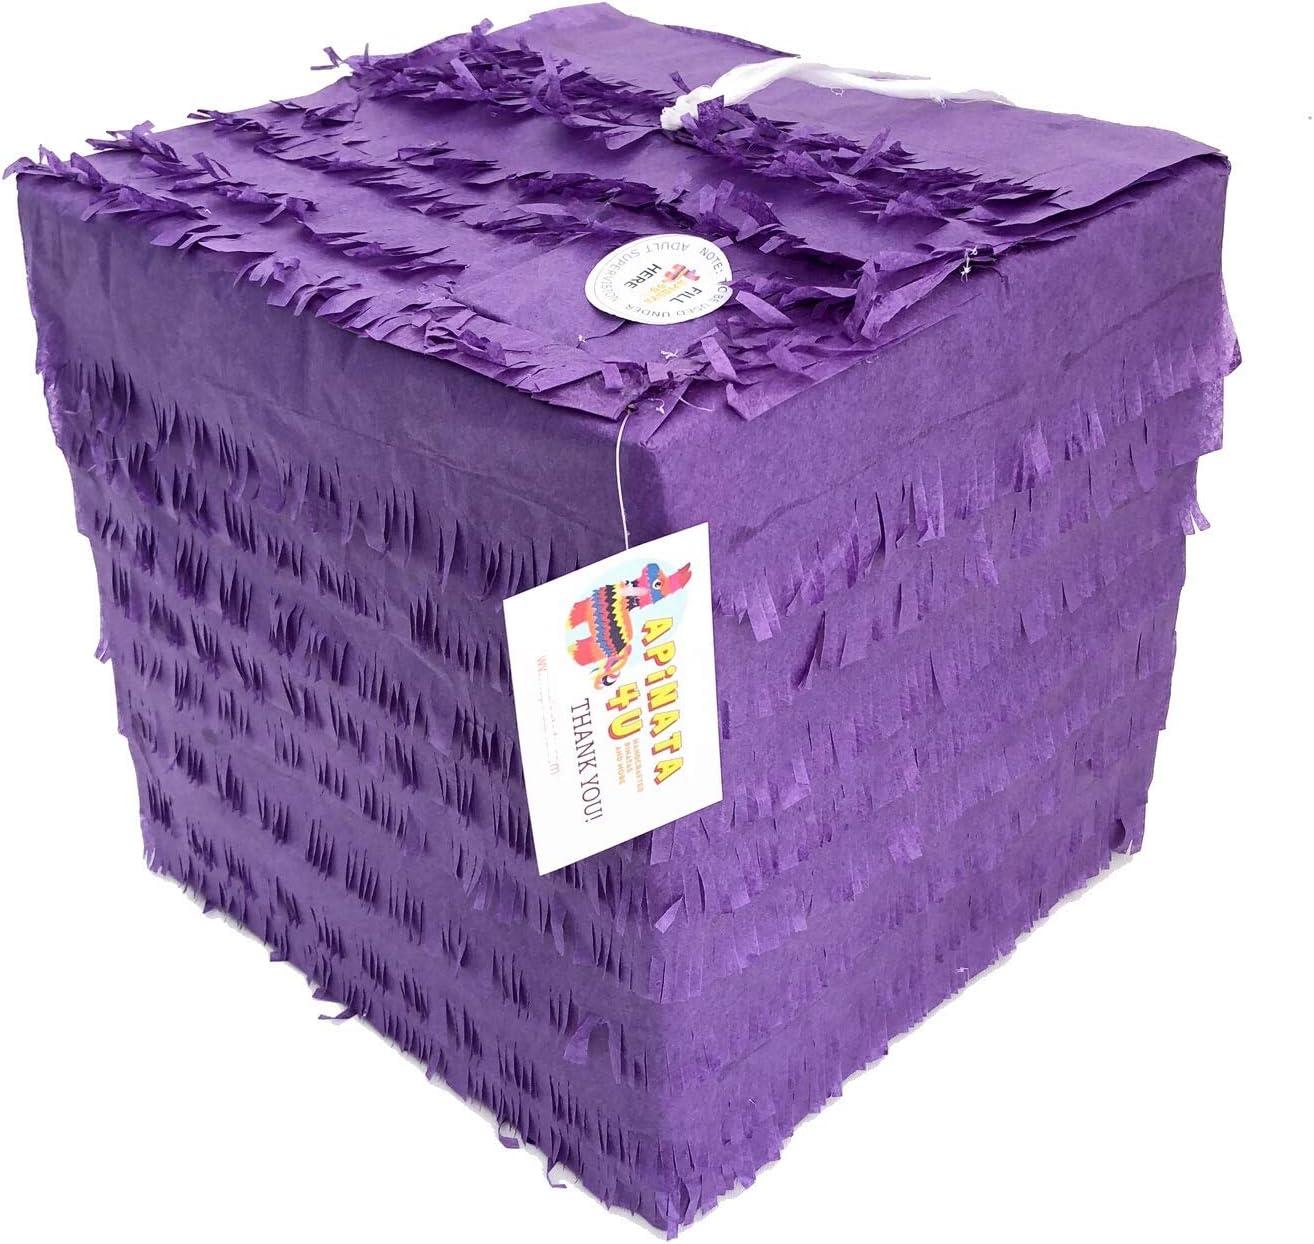 APINATA4U Purple Cube Superior Credence Pinata